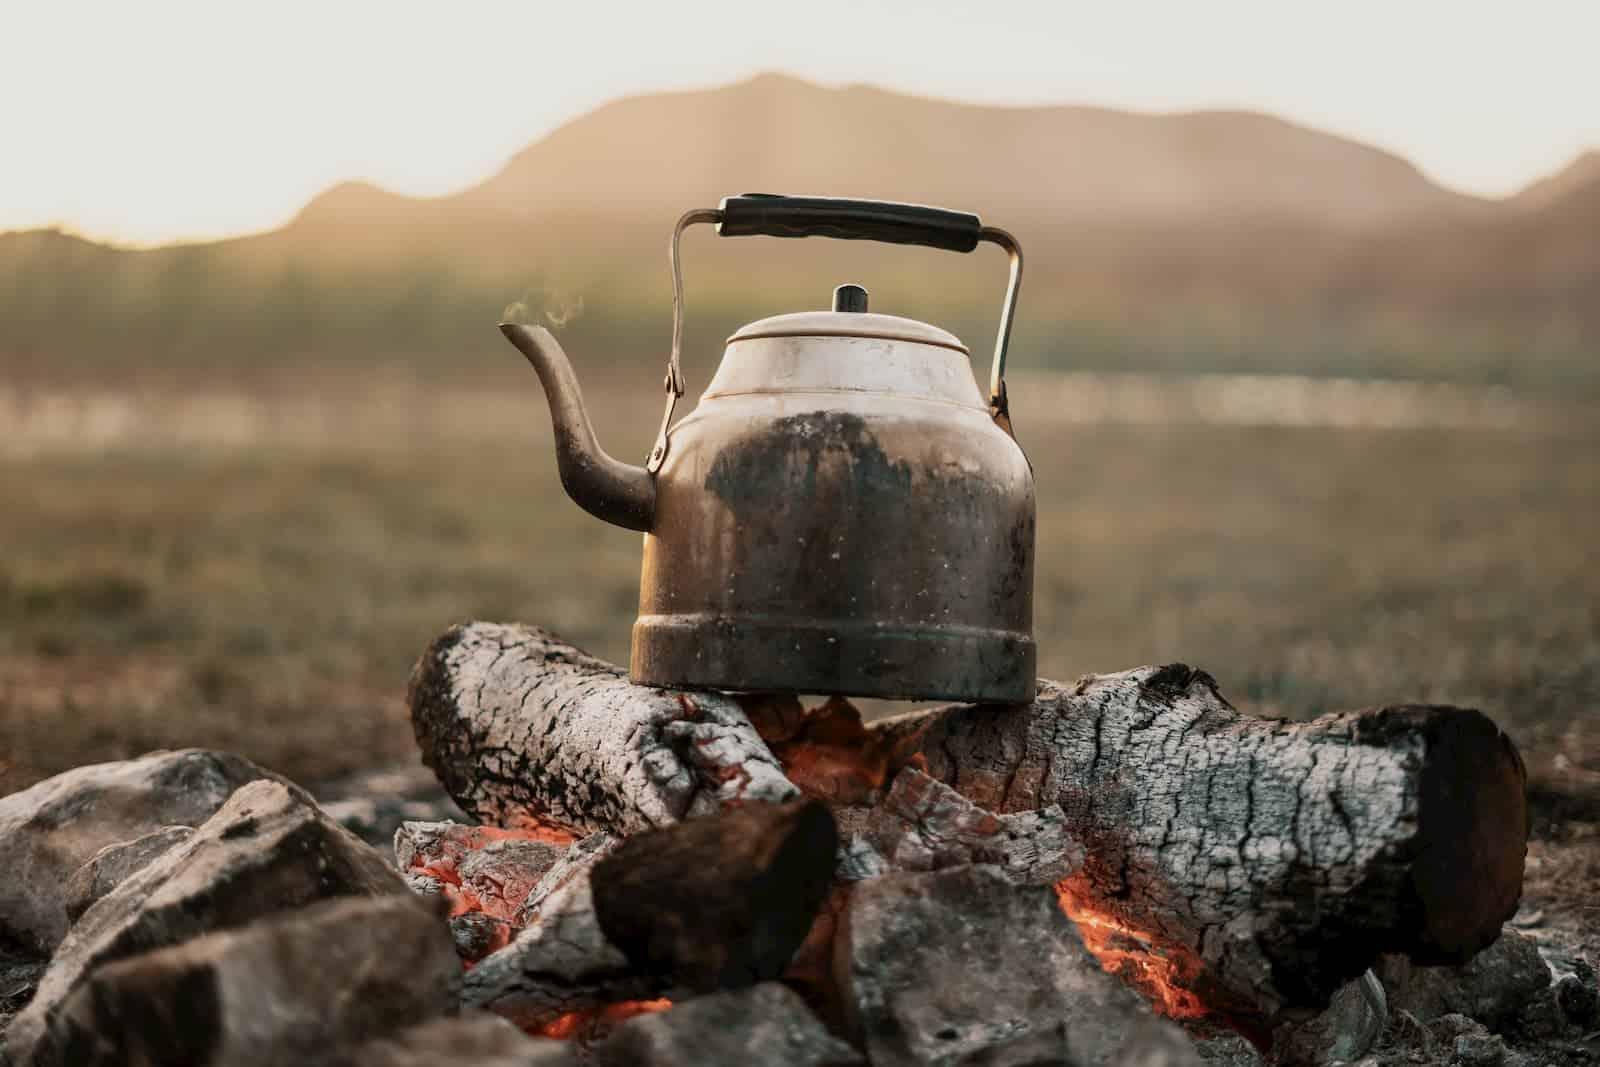 esquentando água pro café